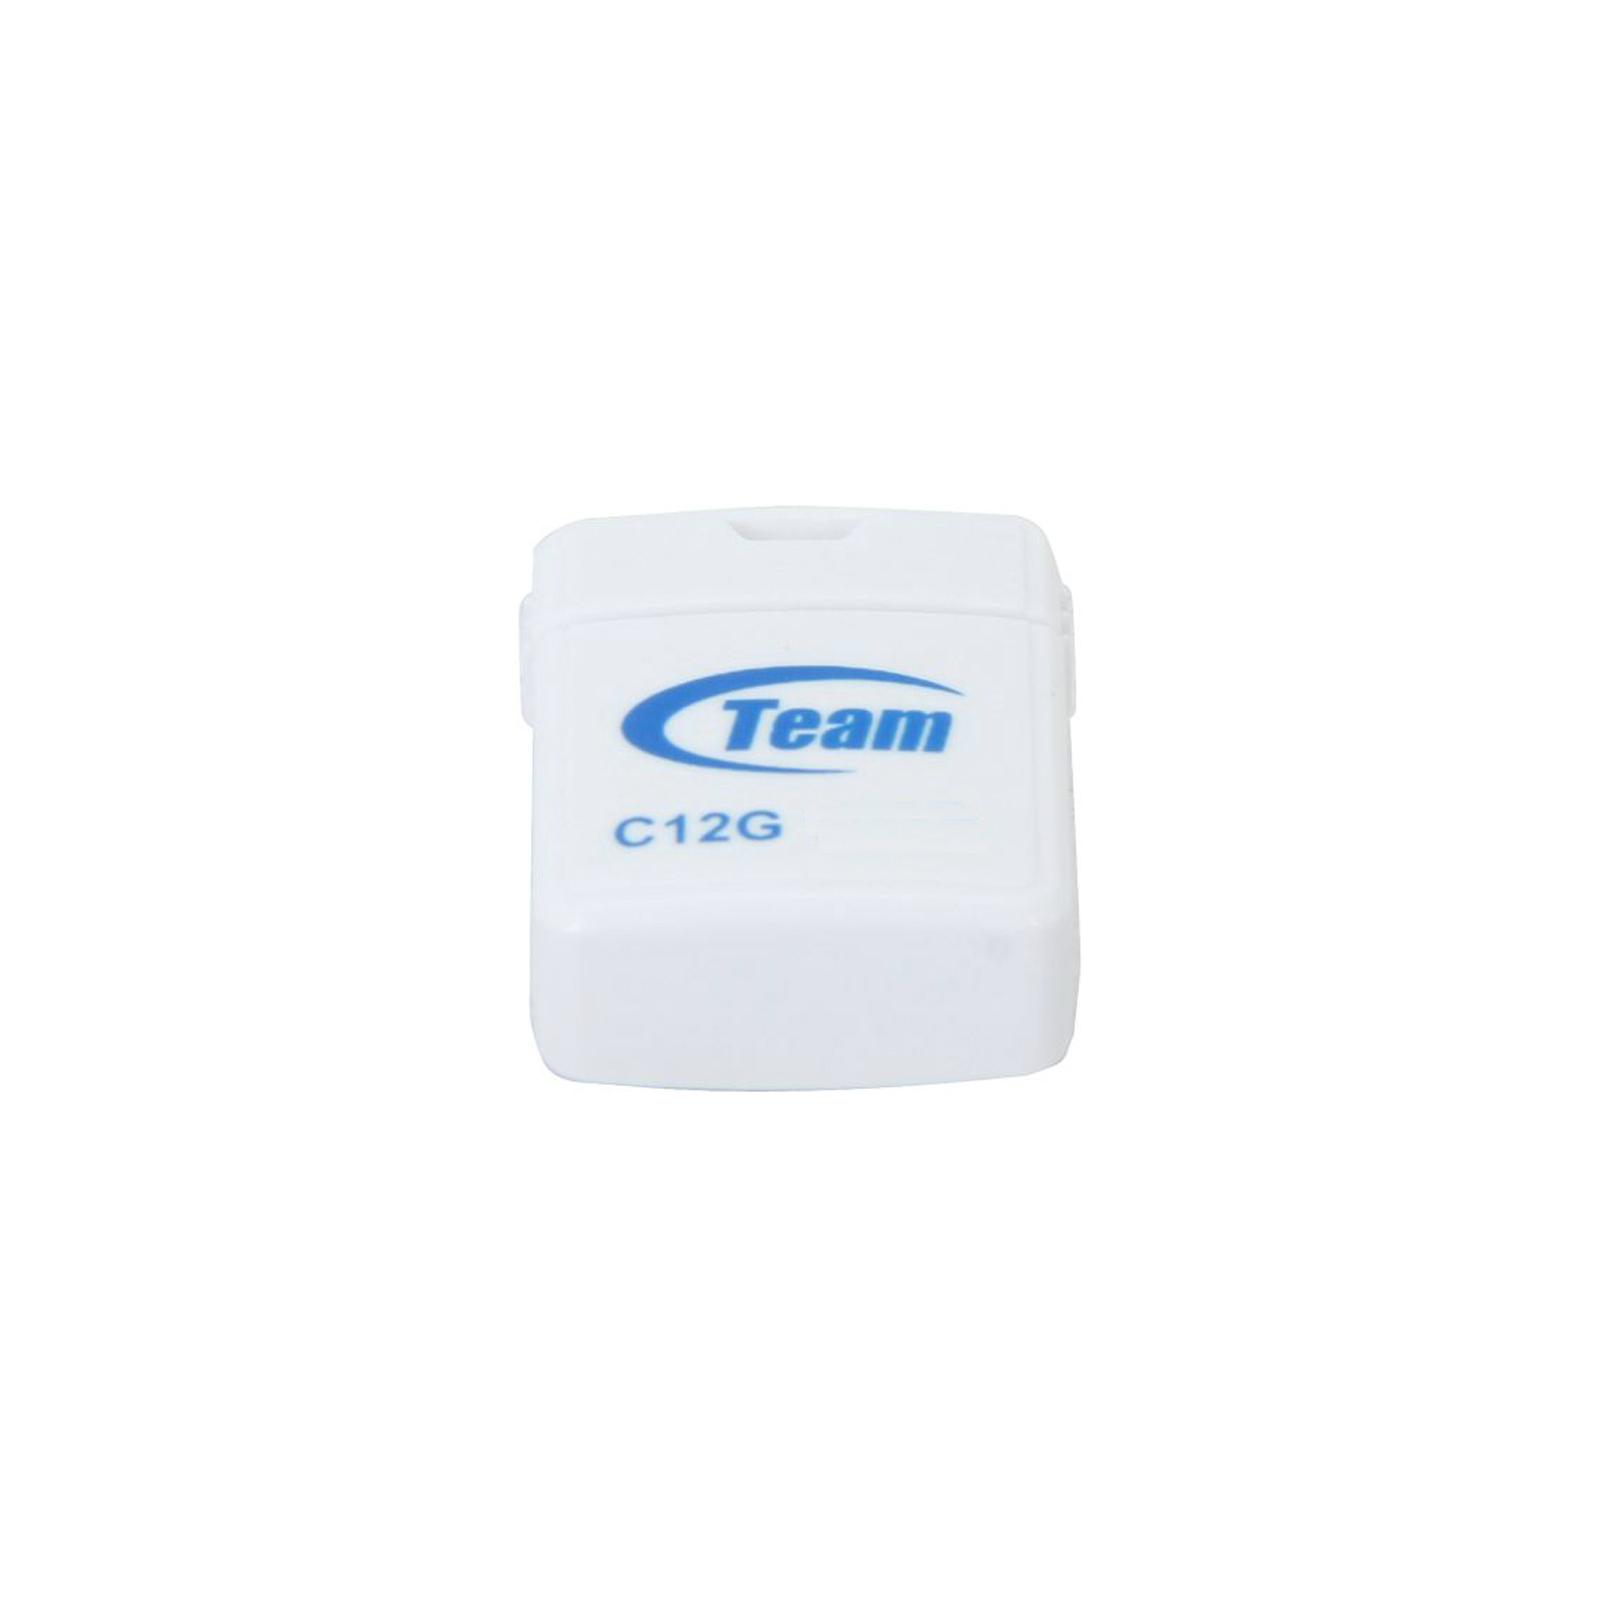 USB флеш накопитель Team 32GB C12G Black USB 2.0 (TC12G32GB01)